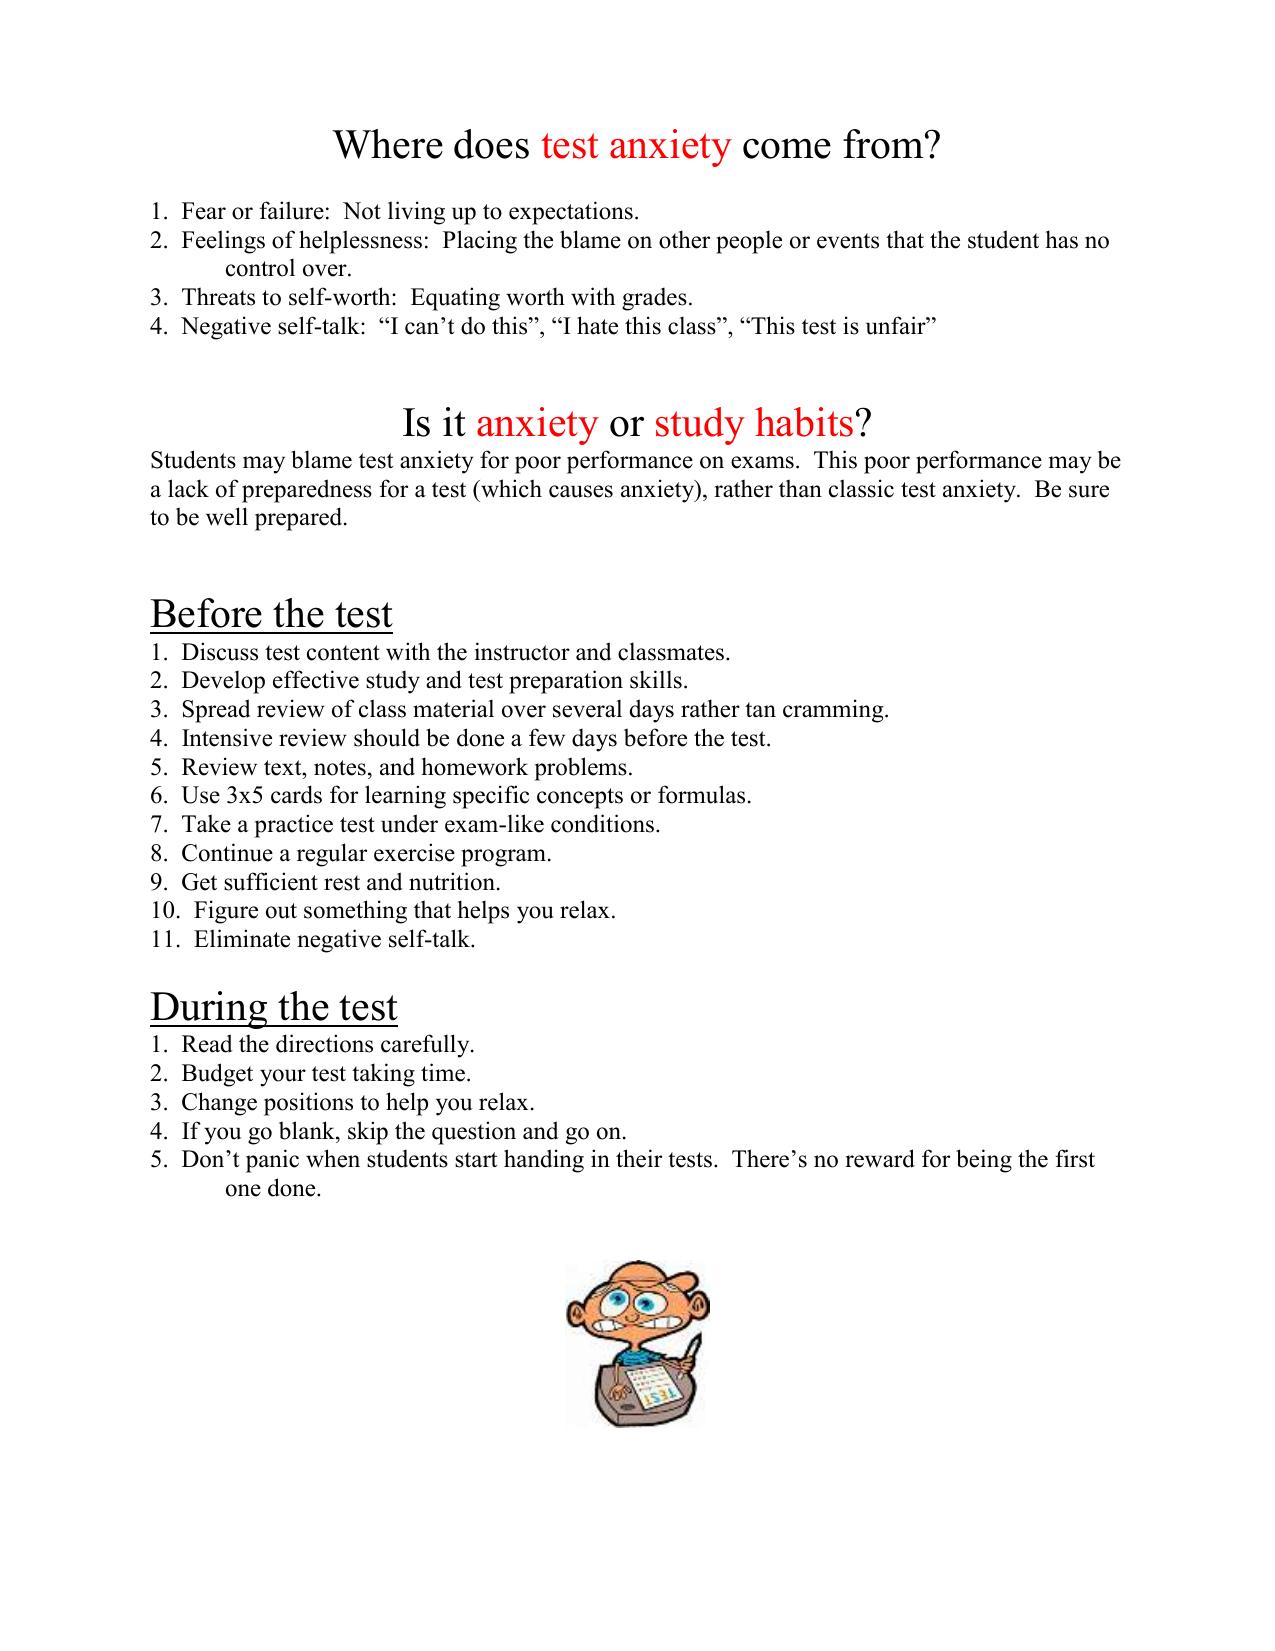 Worksheets Test Anxiety Worksheets test anxiety handout